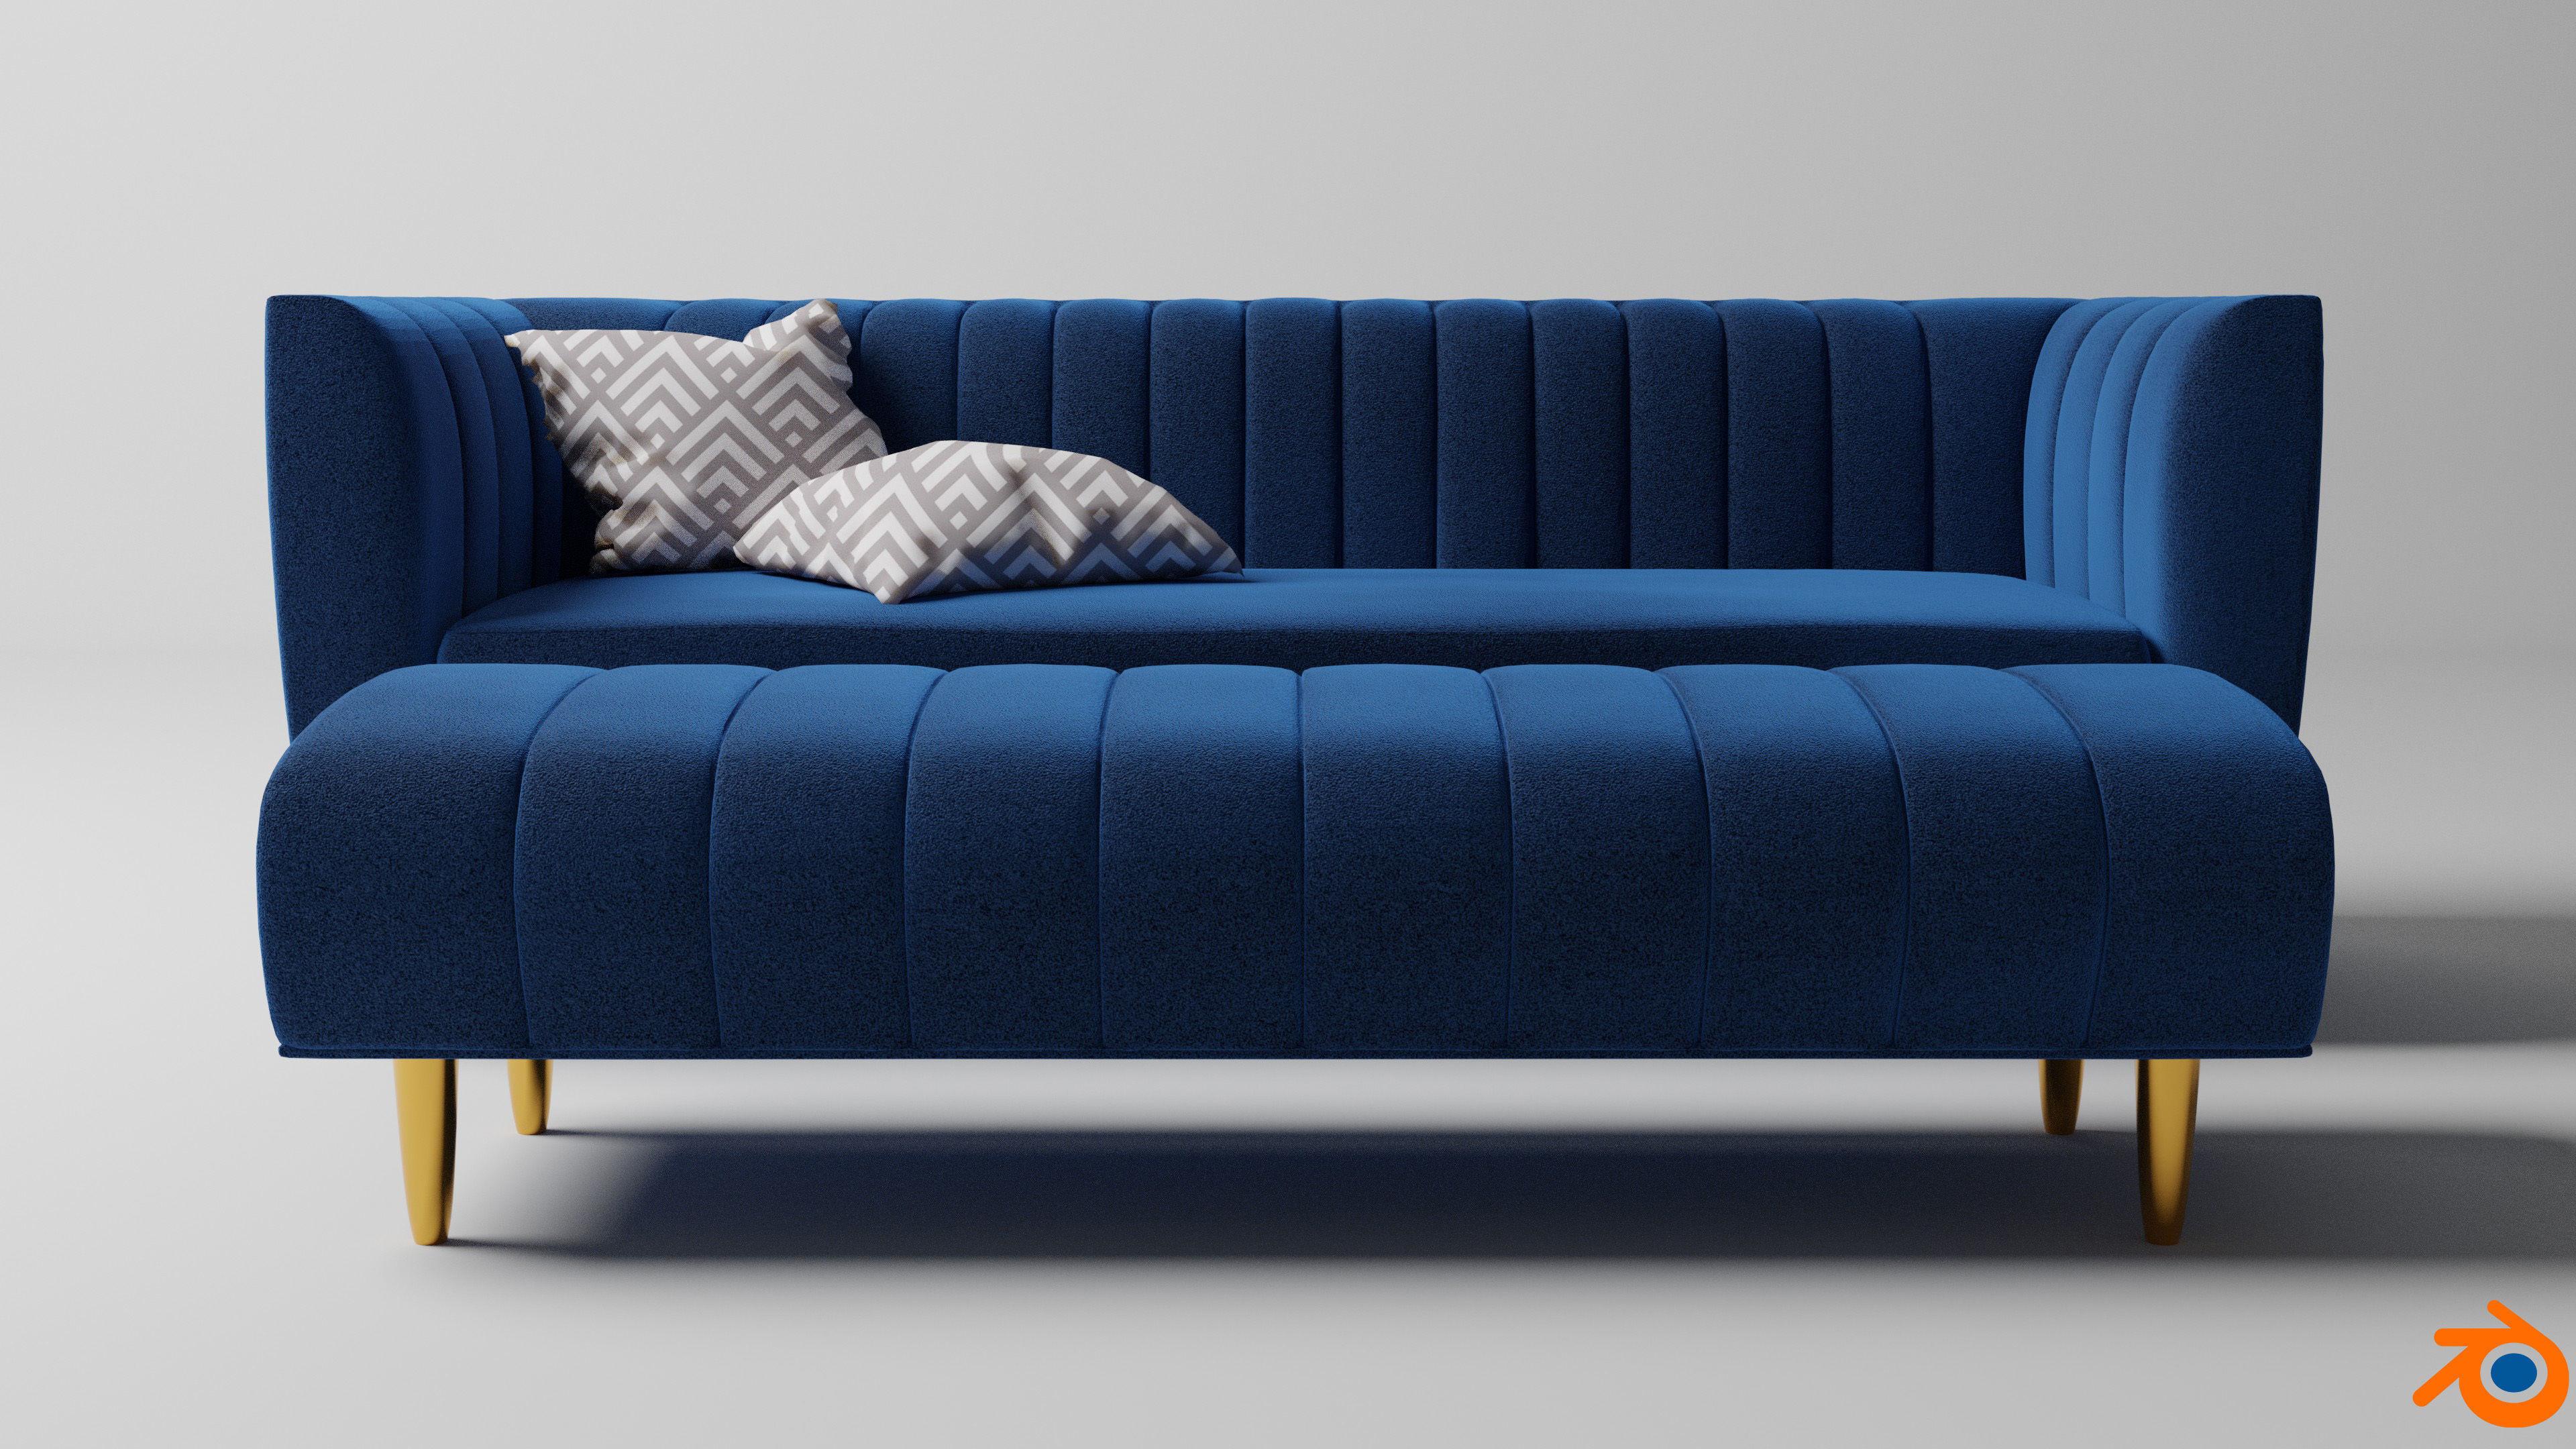 Amicie sofa set 3D model | CGTrader